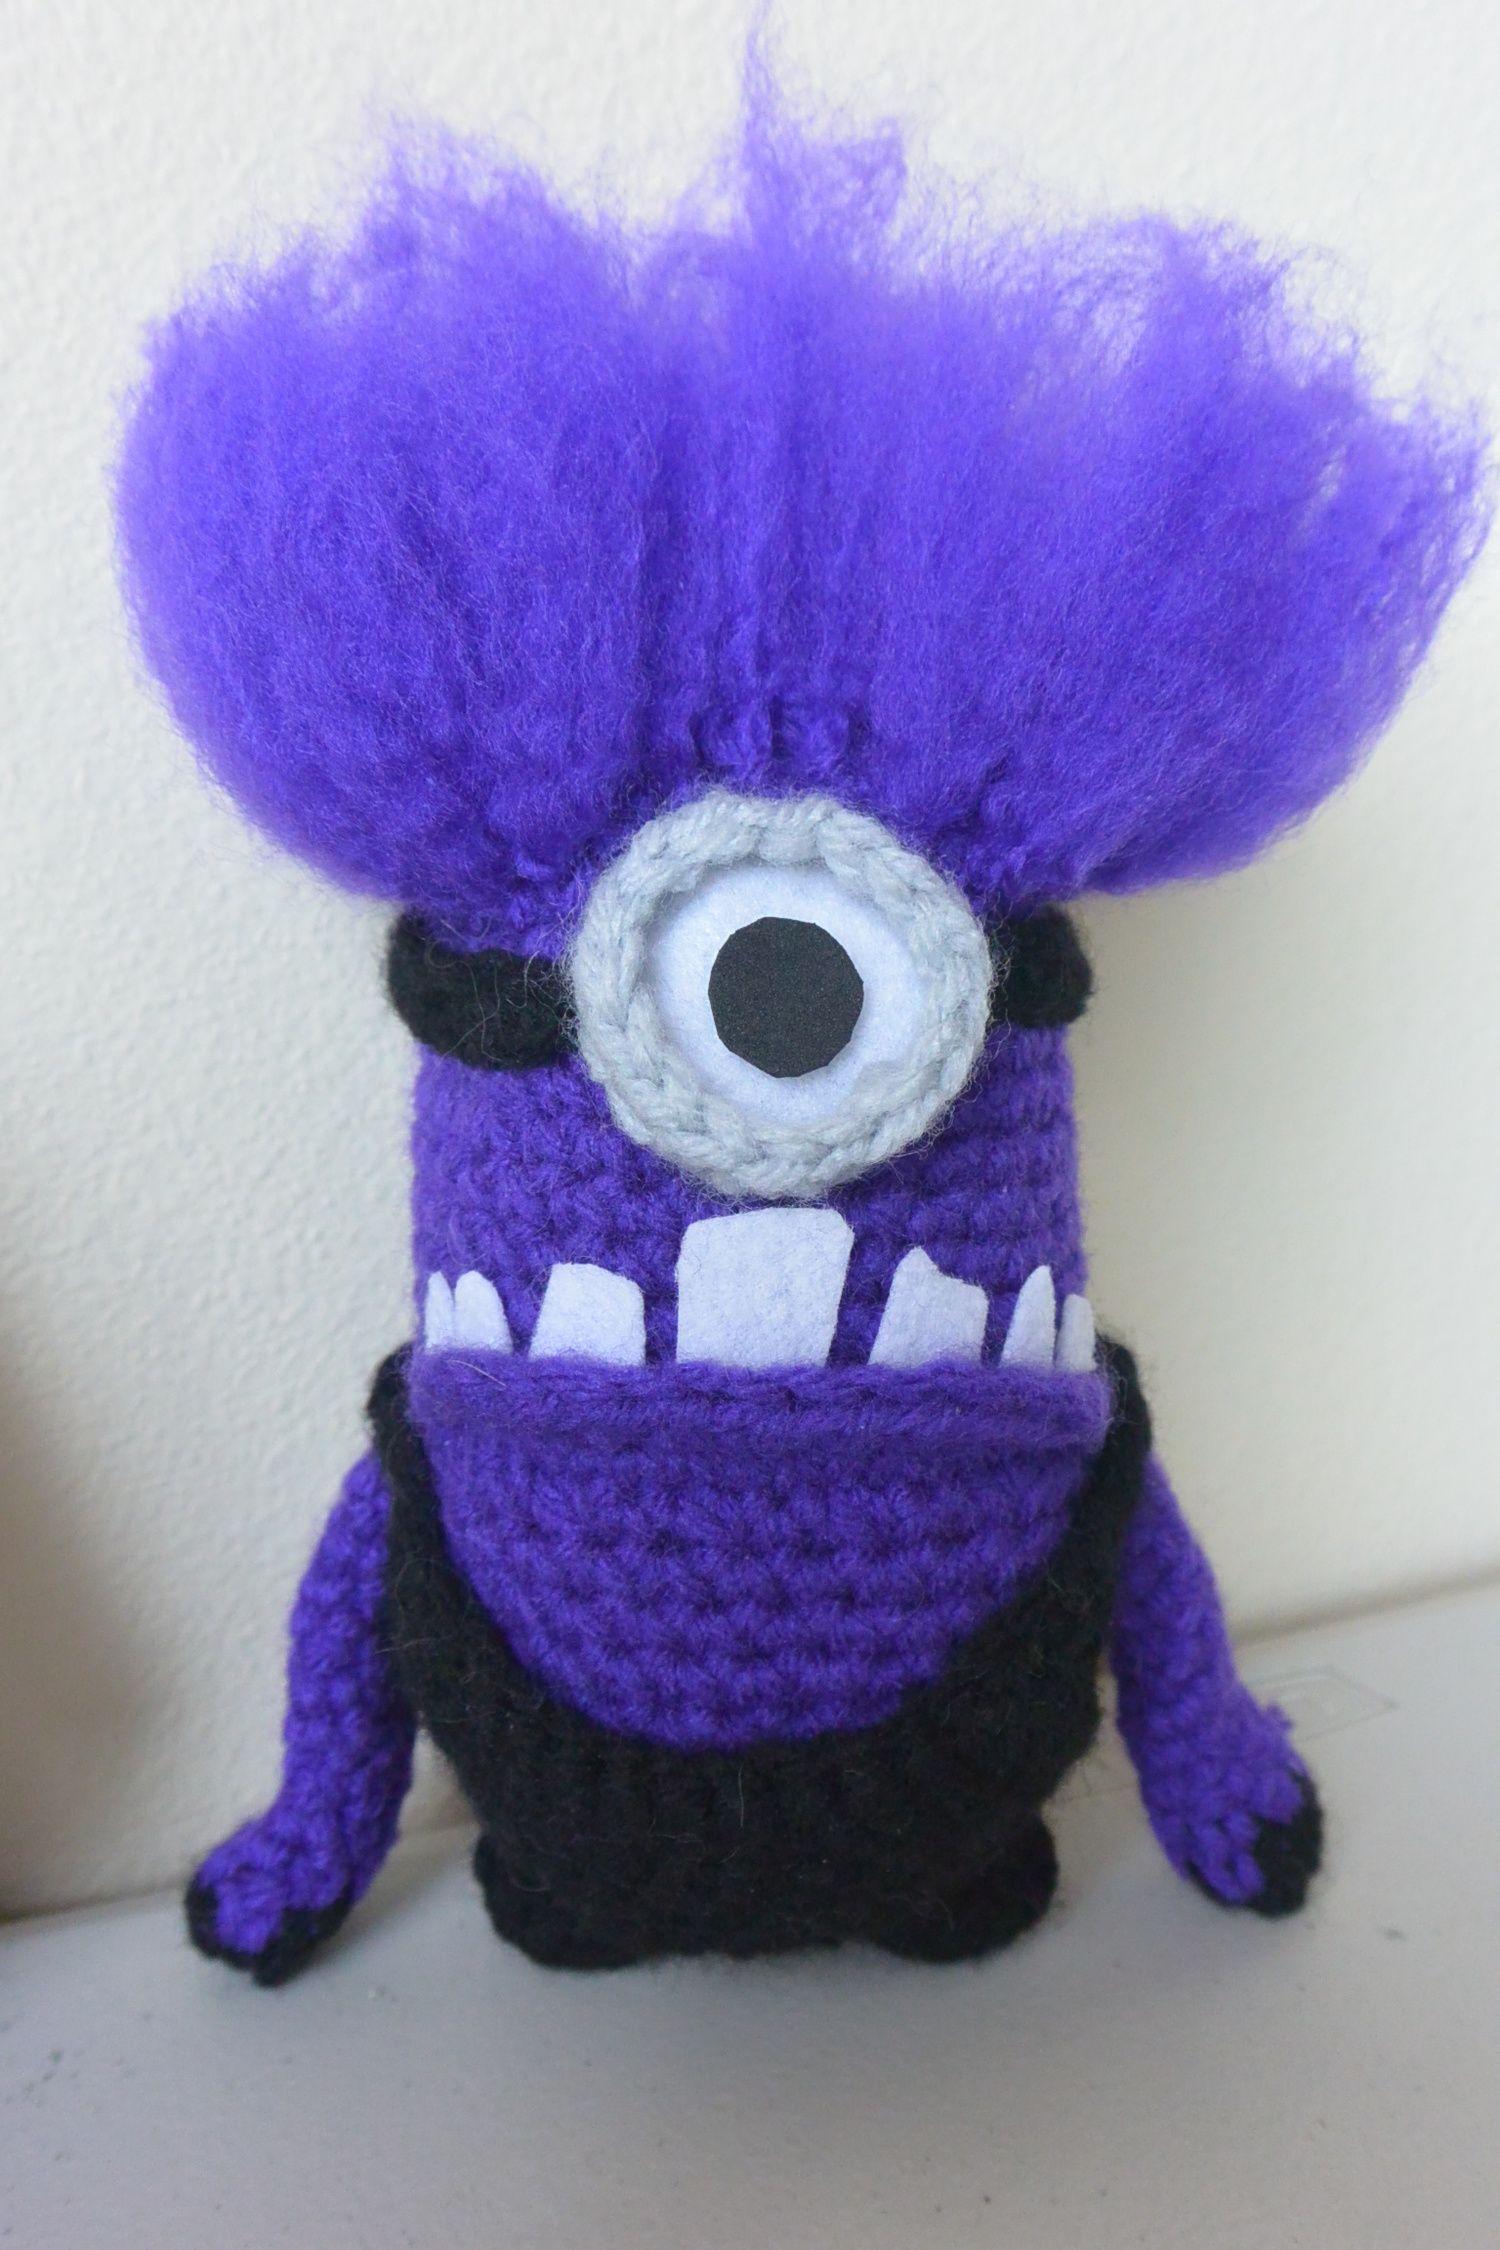 Aug 22 Despicable Me 2: Evil Minion Crochet & Hair Tutorial | Häkeln